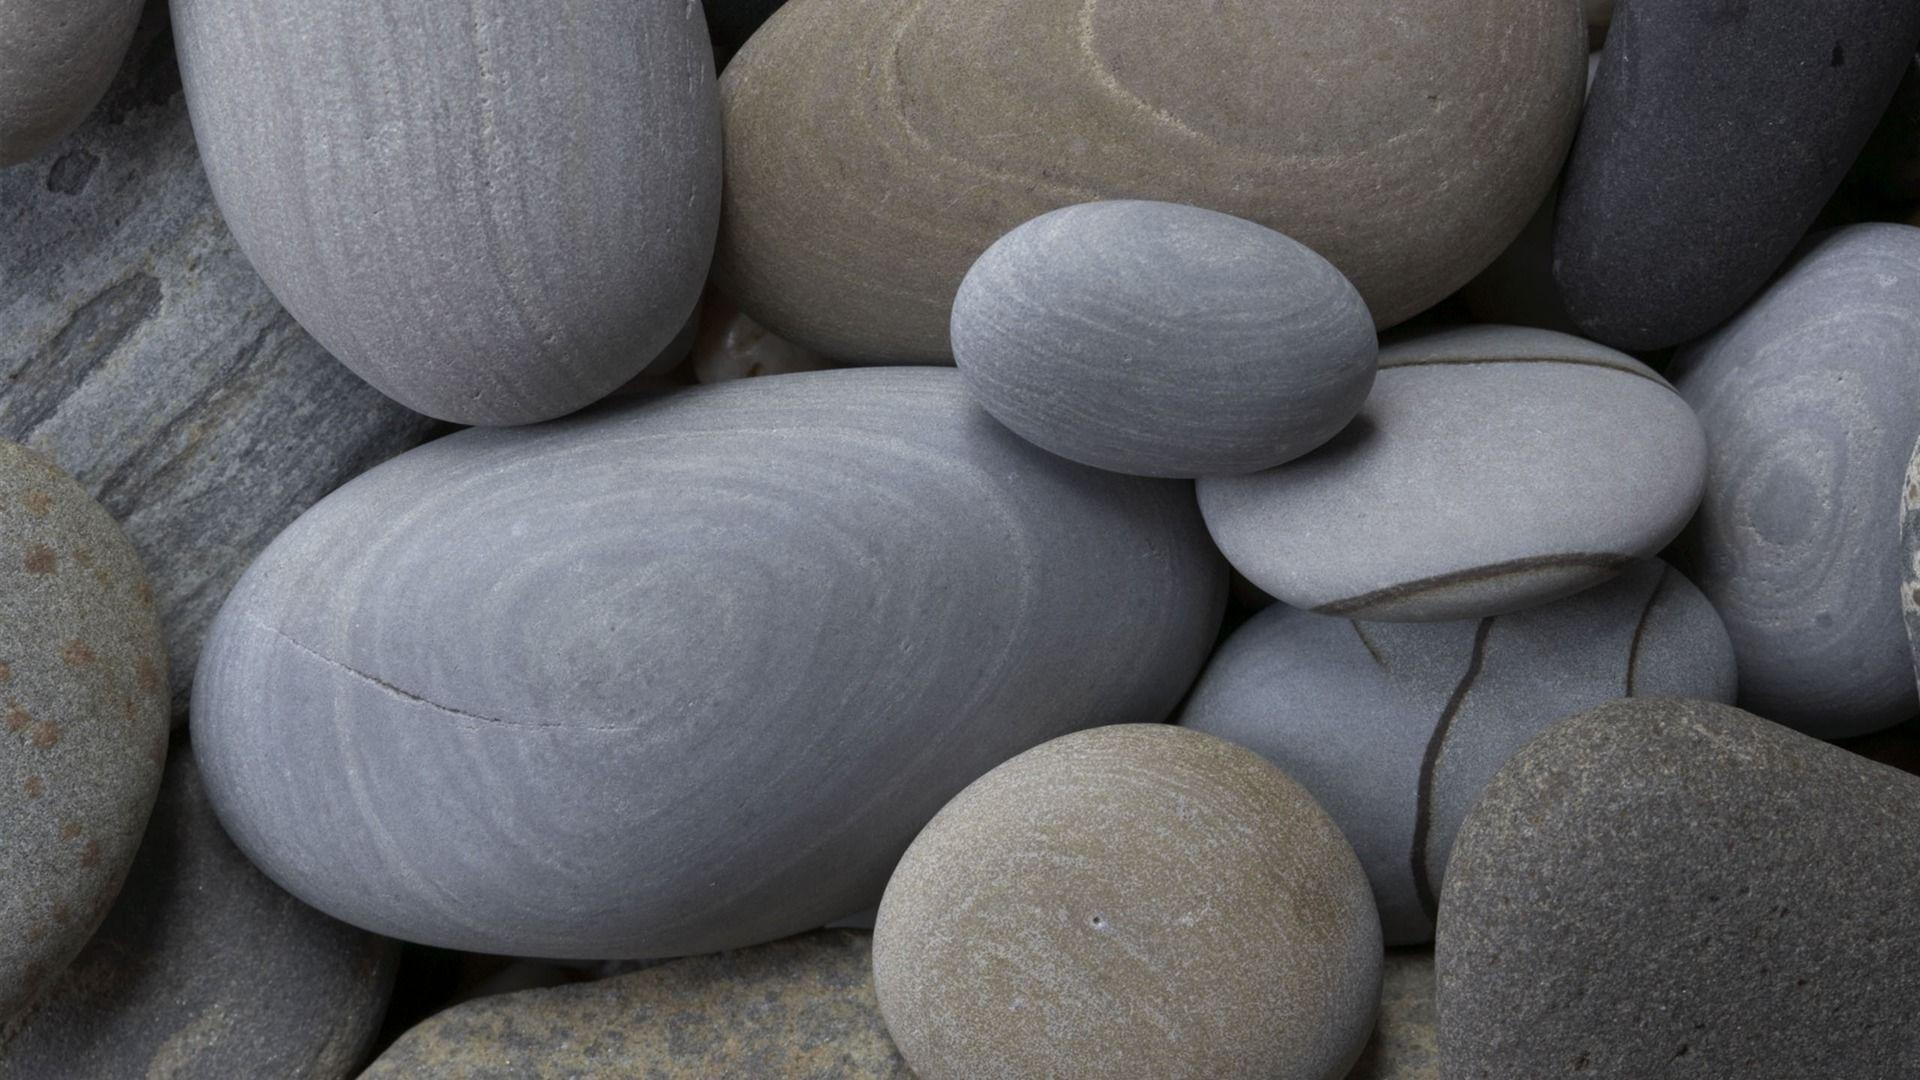 high resolution apple mac os x wallpaper hd  full size  - pebbles rocks stones high quality and resolution desktop wallpaper